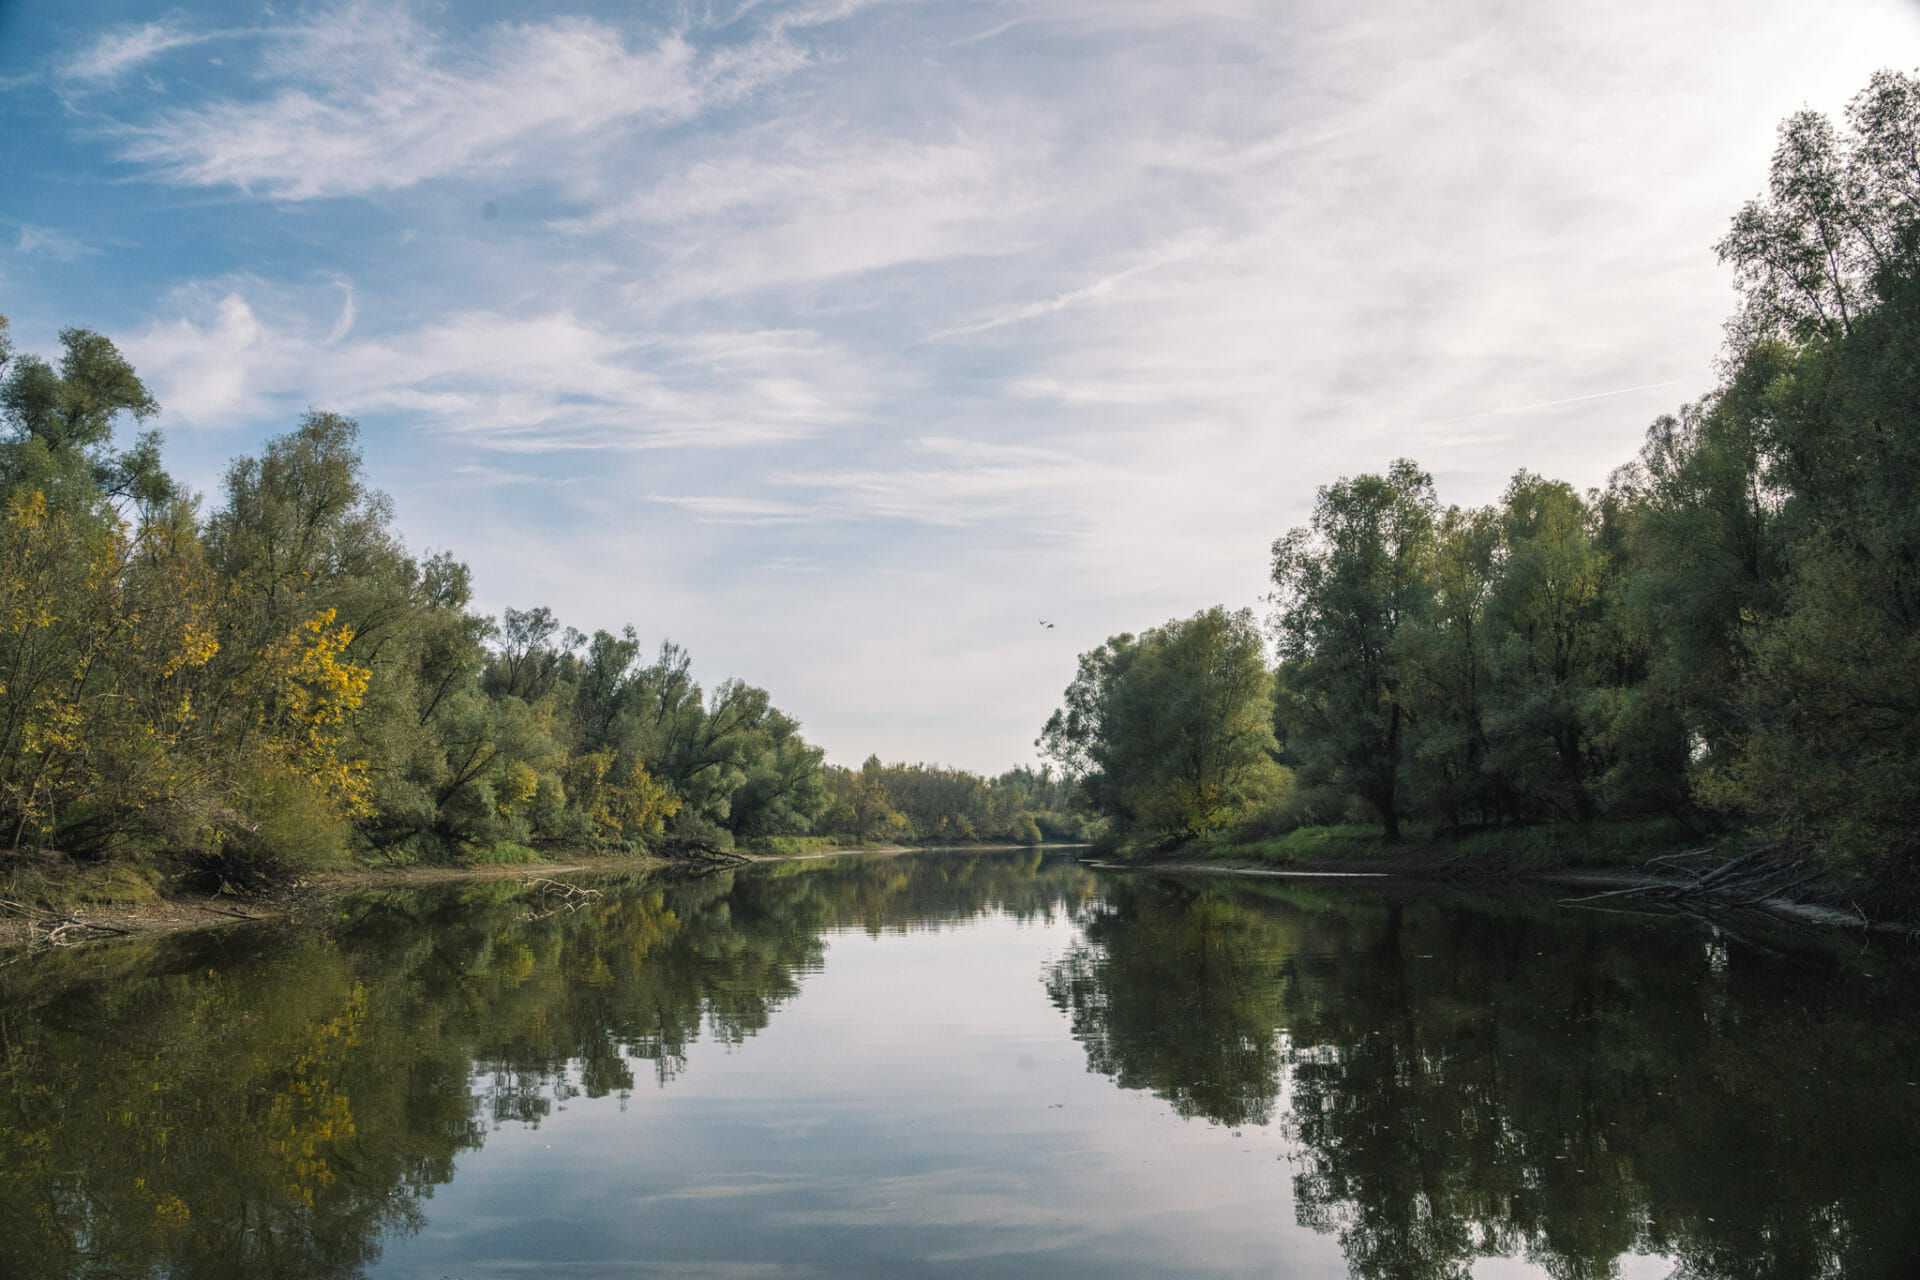 kopacki-parc-slavonia-croatia